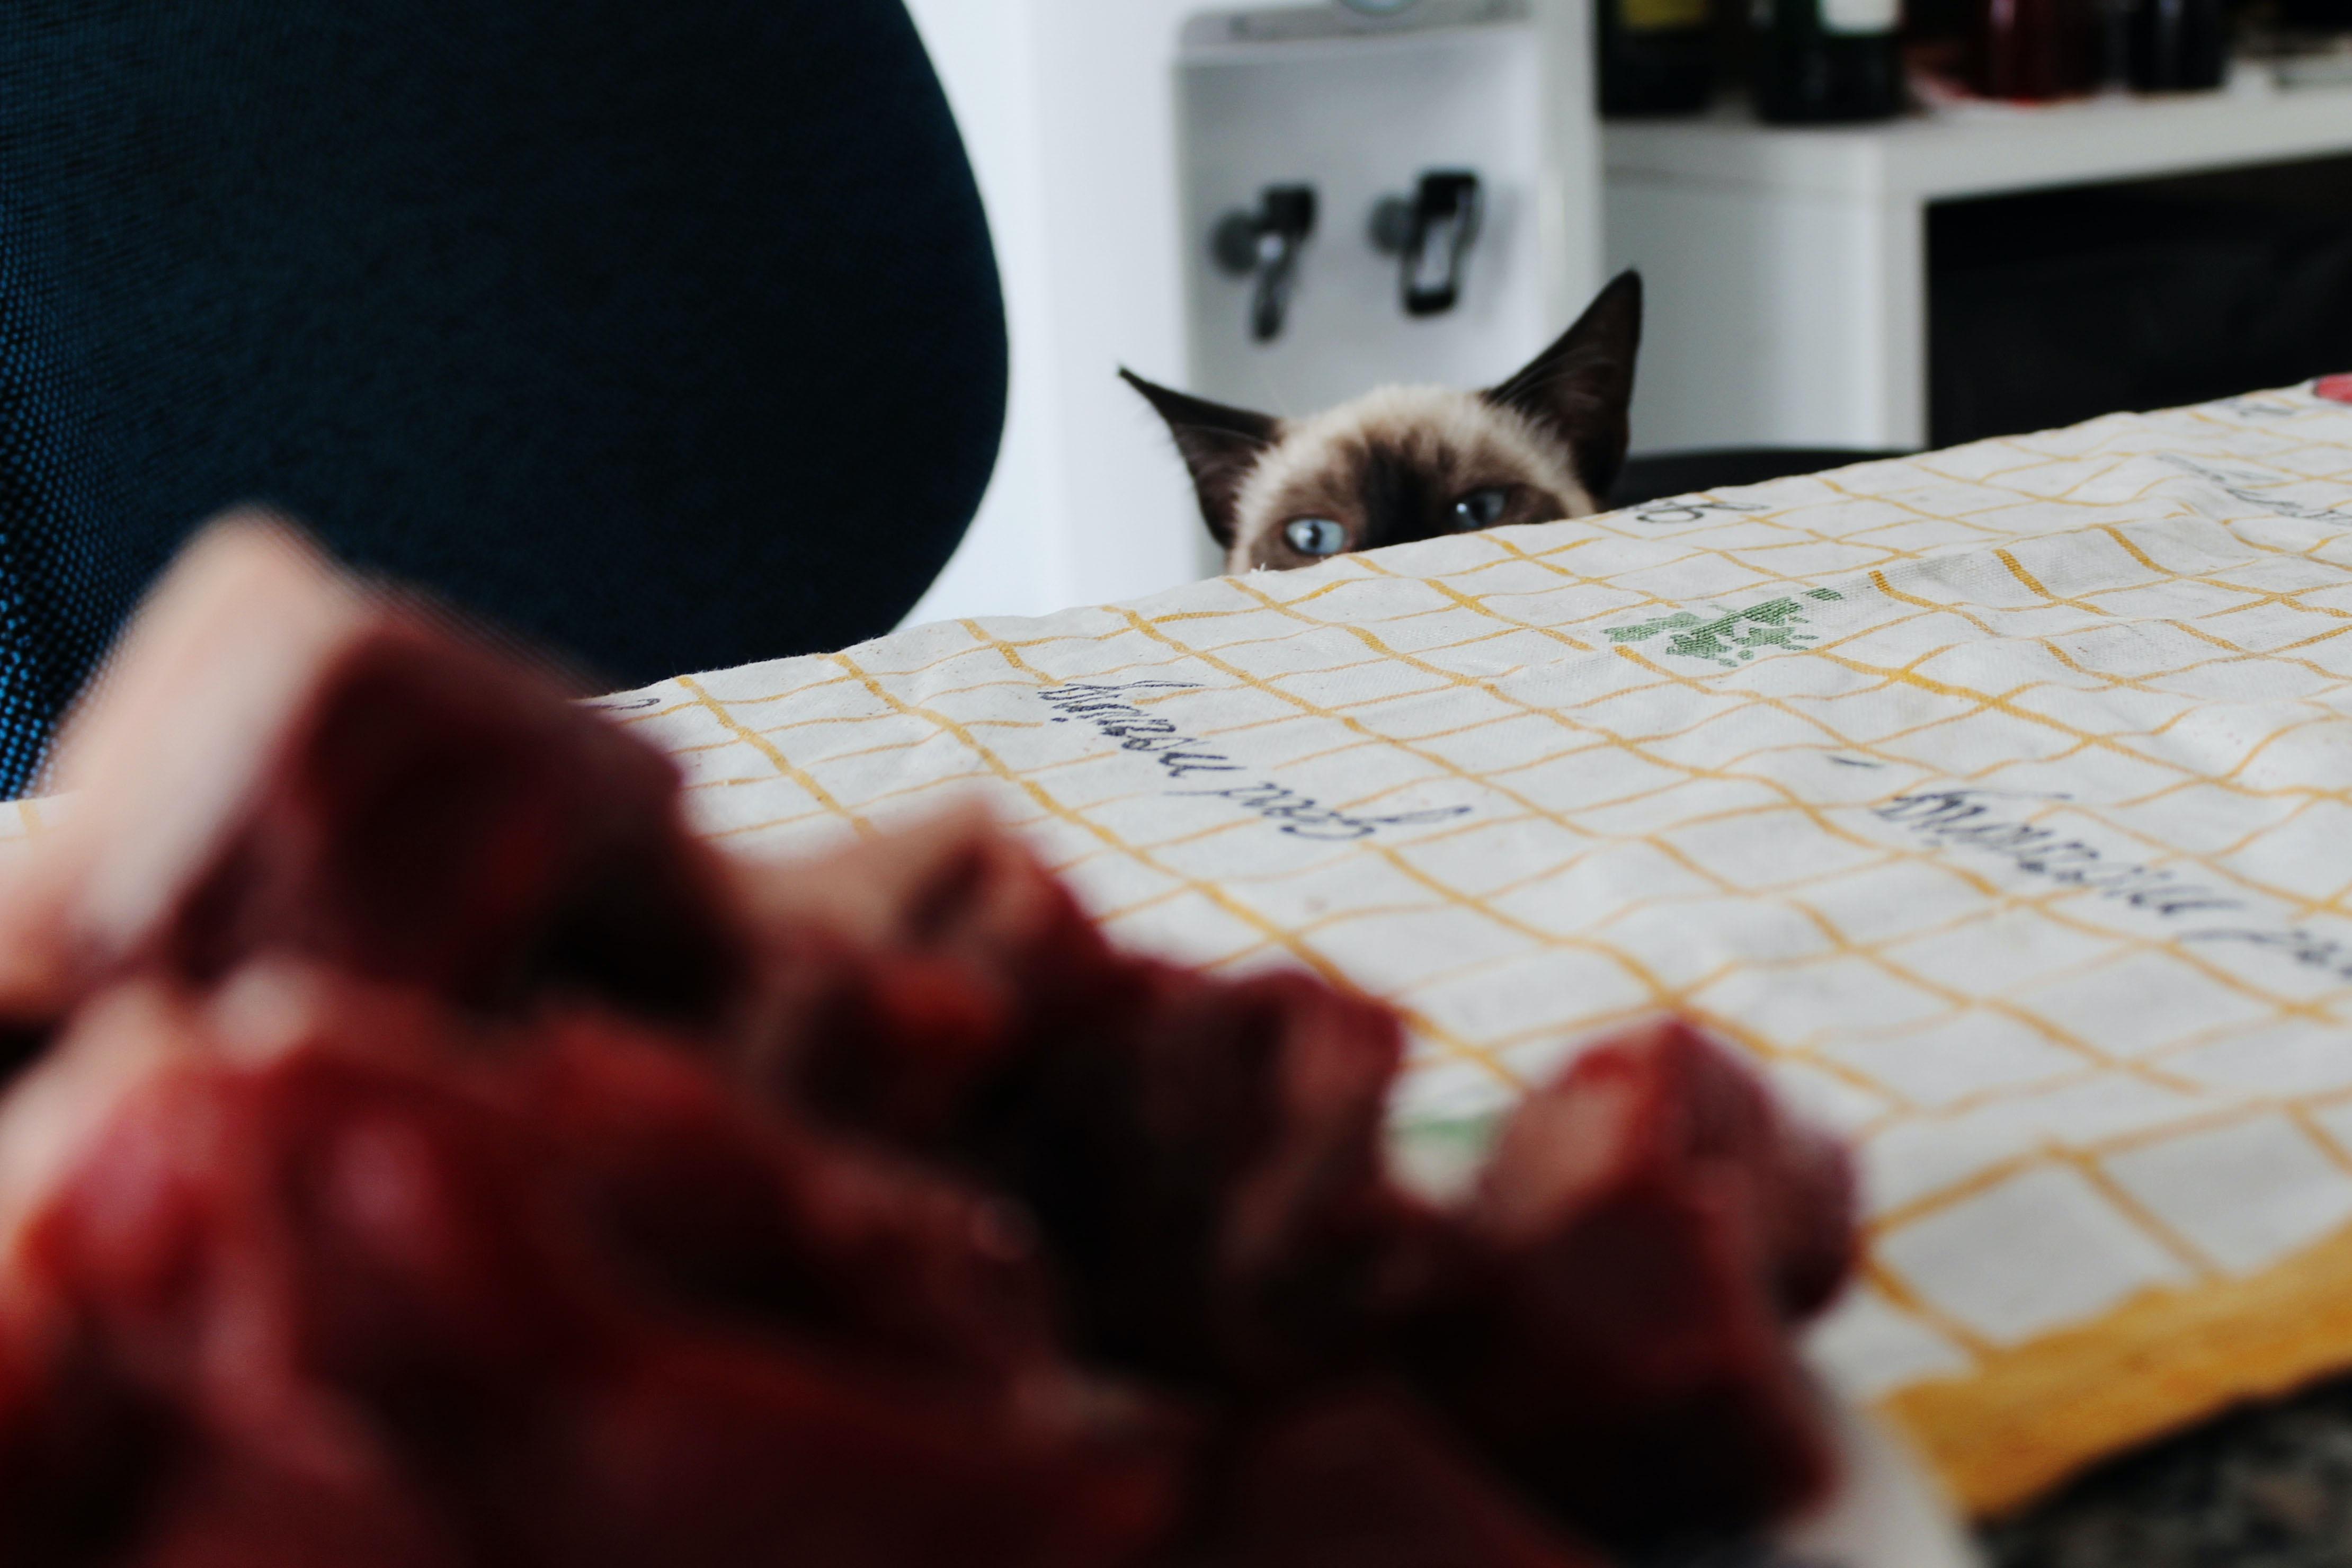 Siamese cat peeping near edge of table